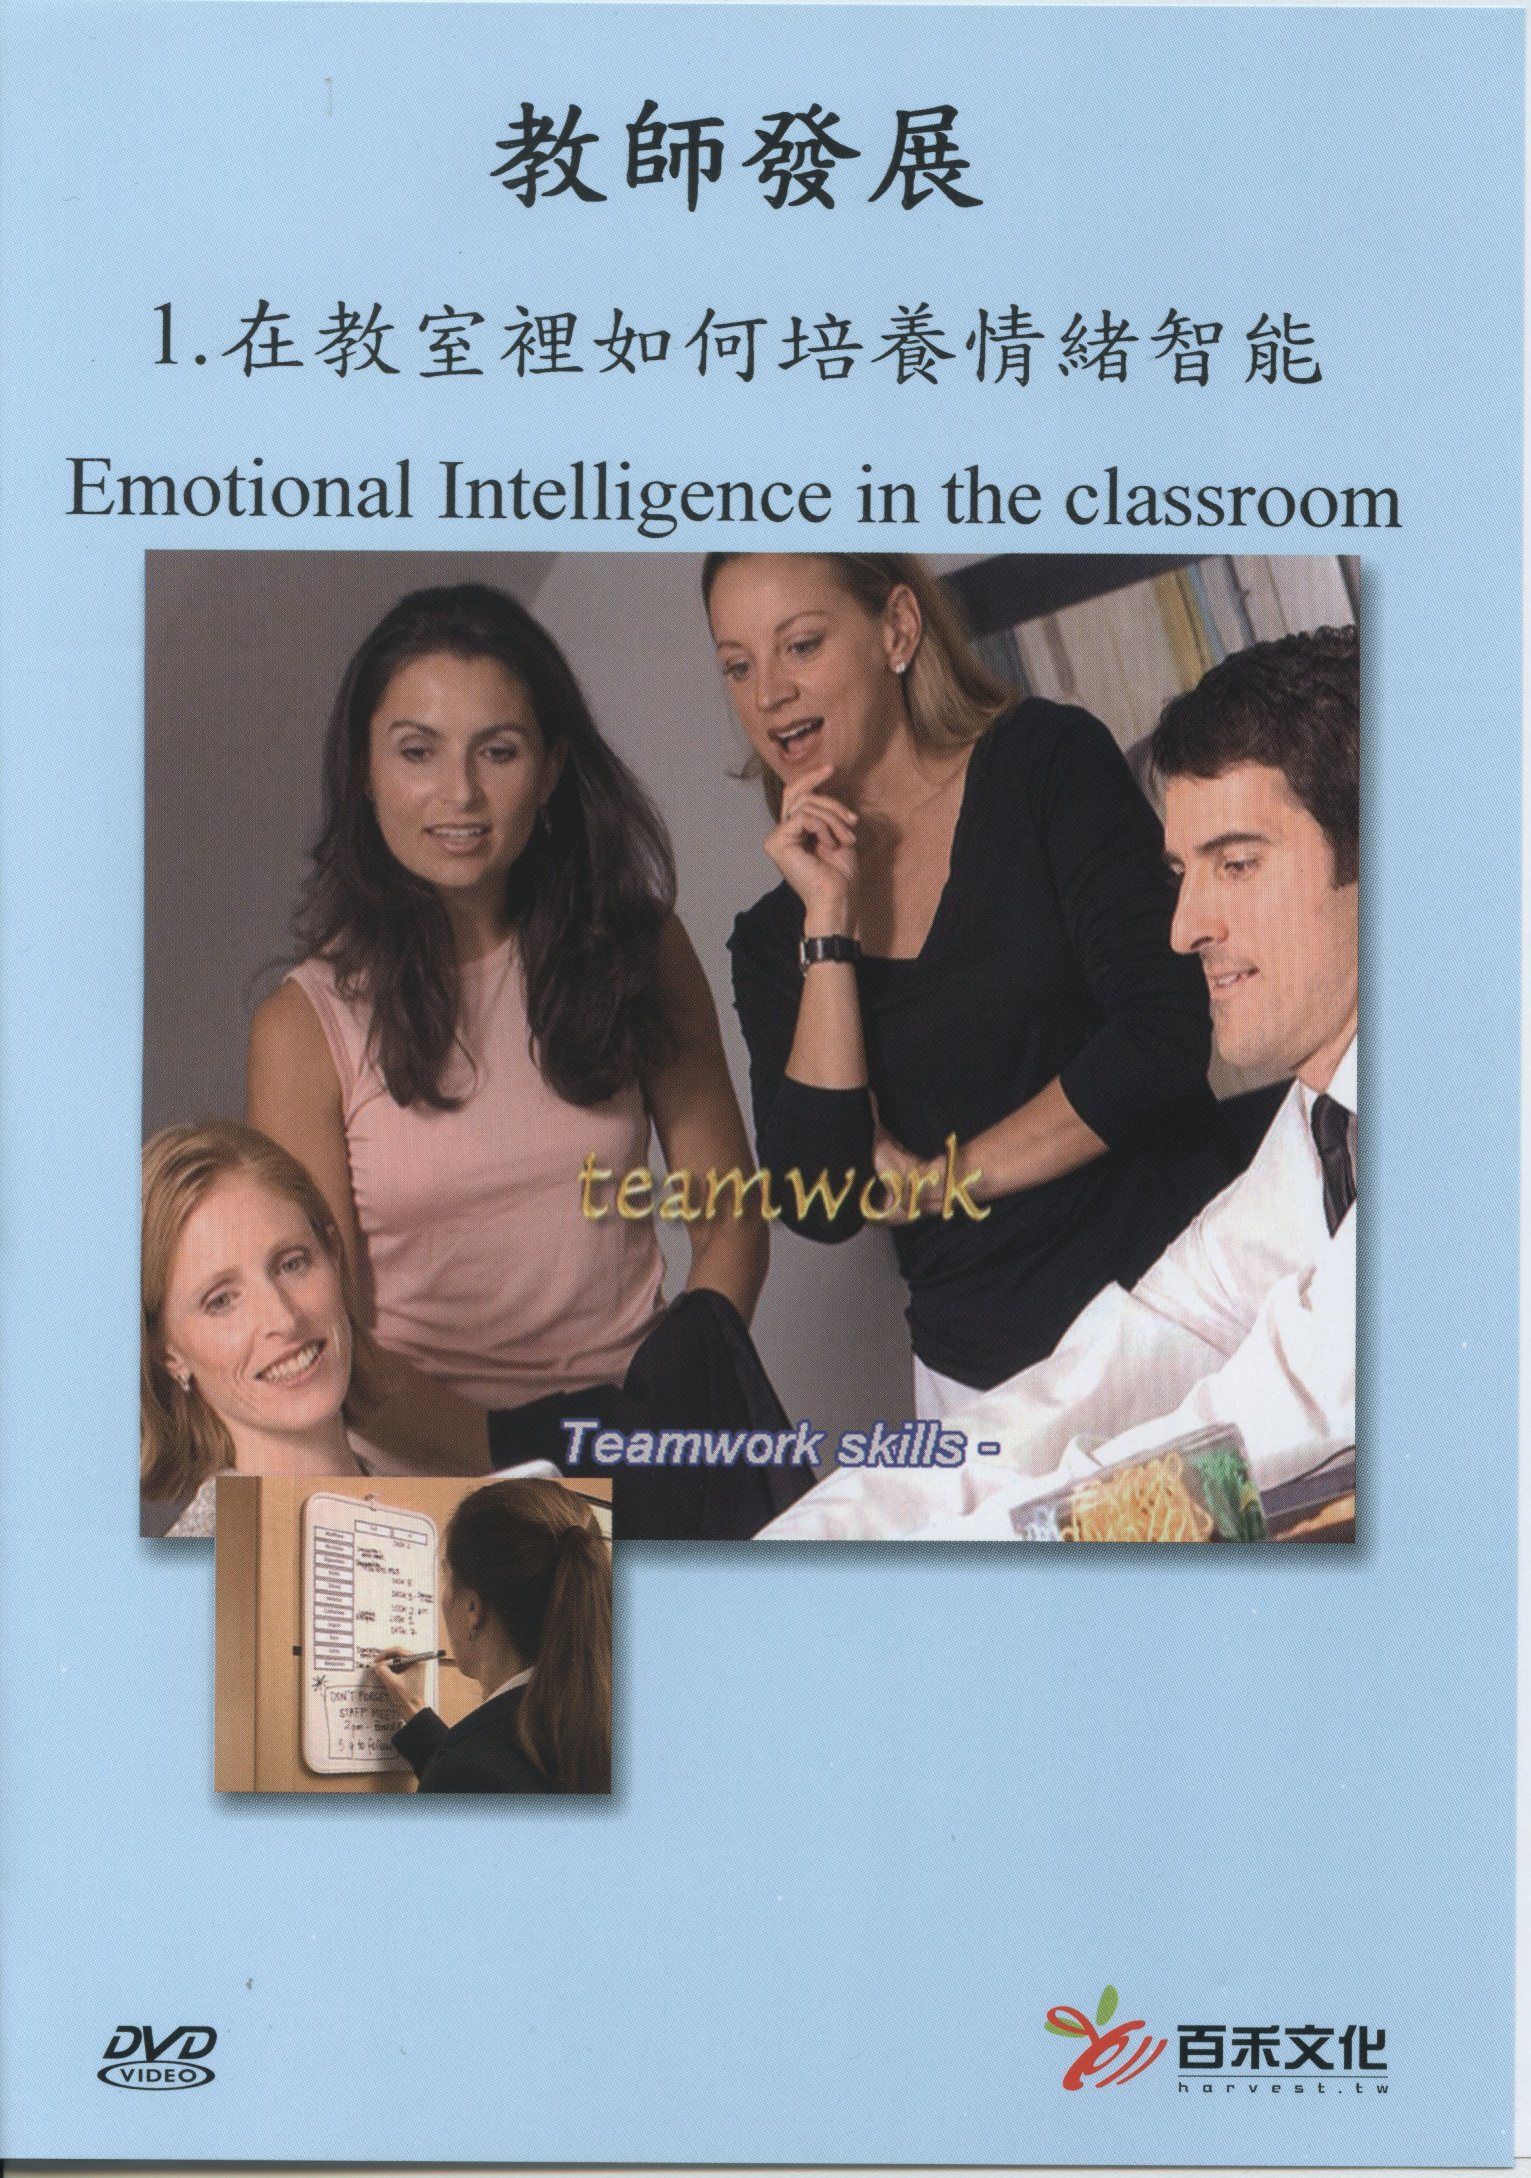 教師發展 在教室裡如何培養情緒智能 = Emotional intelligence in the classroom